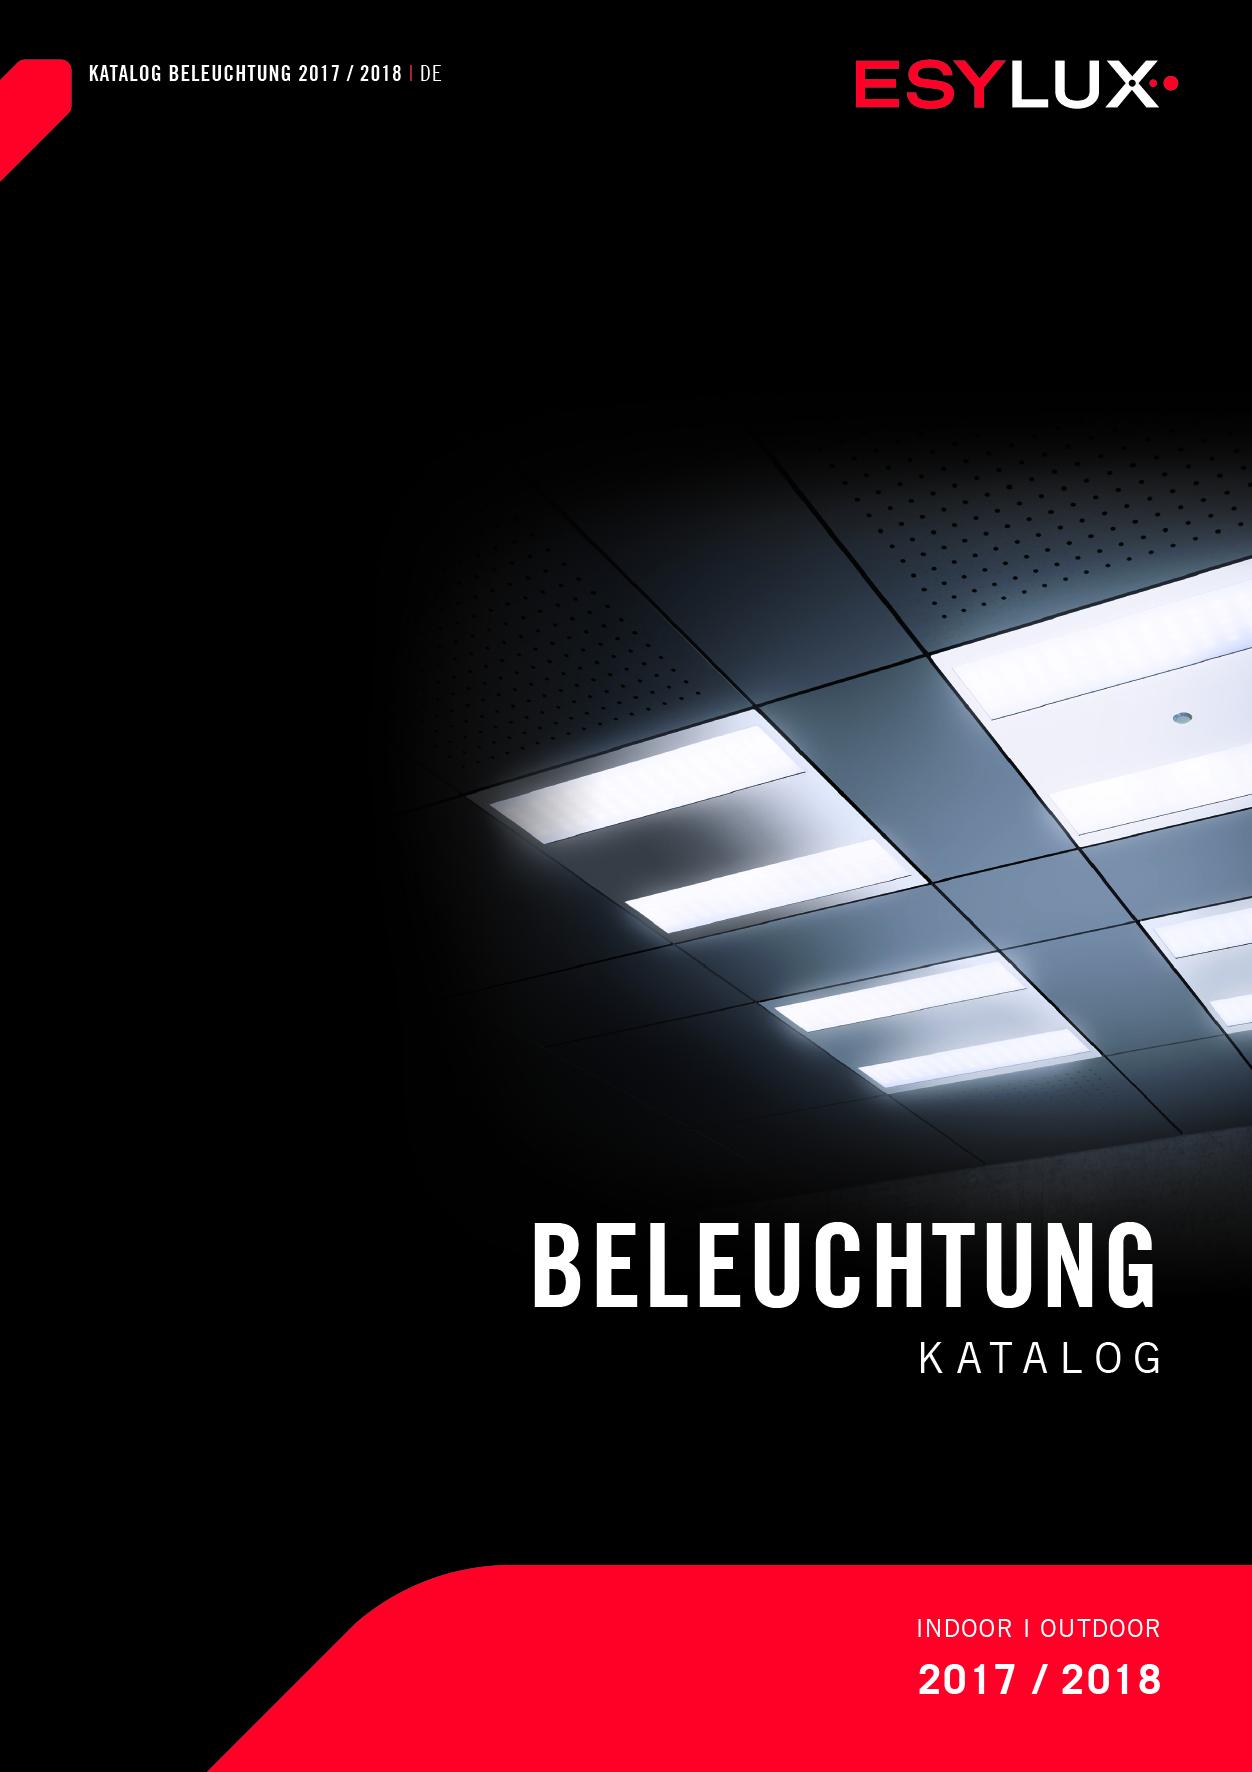 Katalog Beleuchtung 2017 / 2018